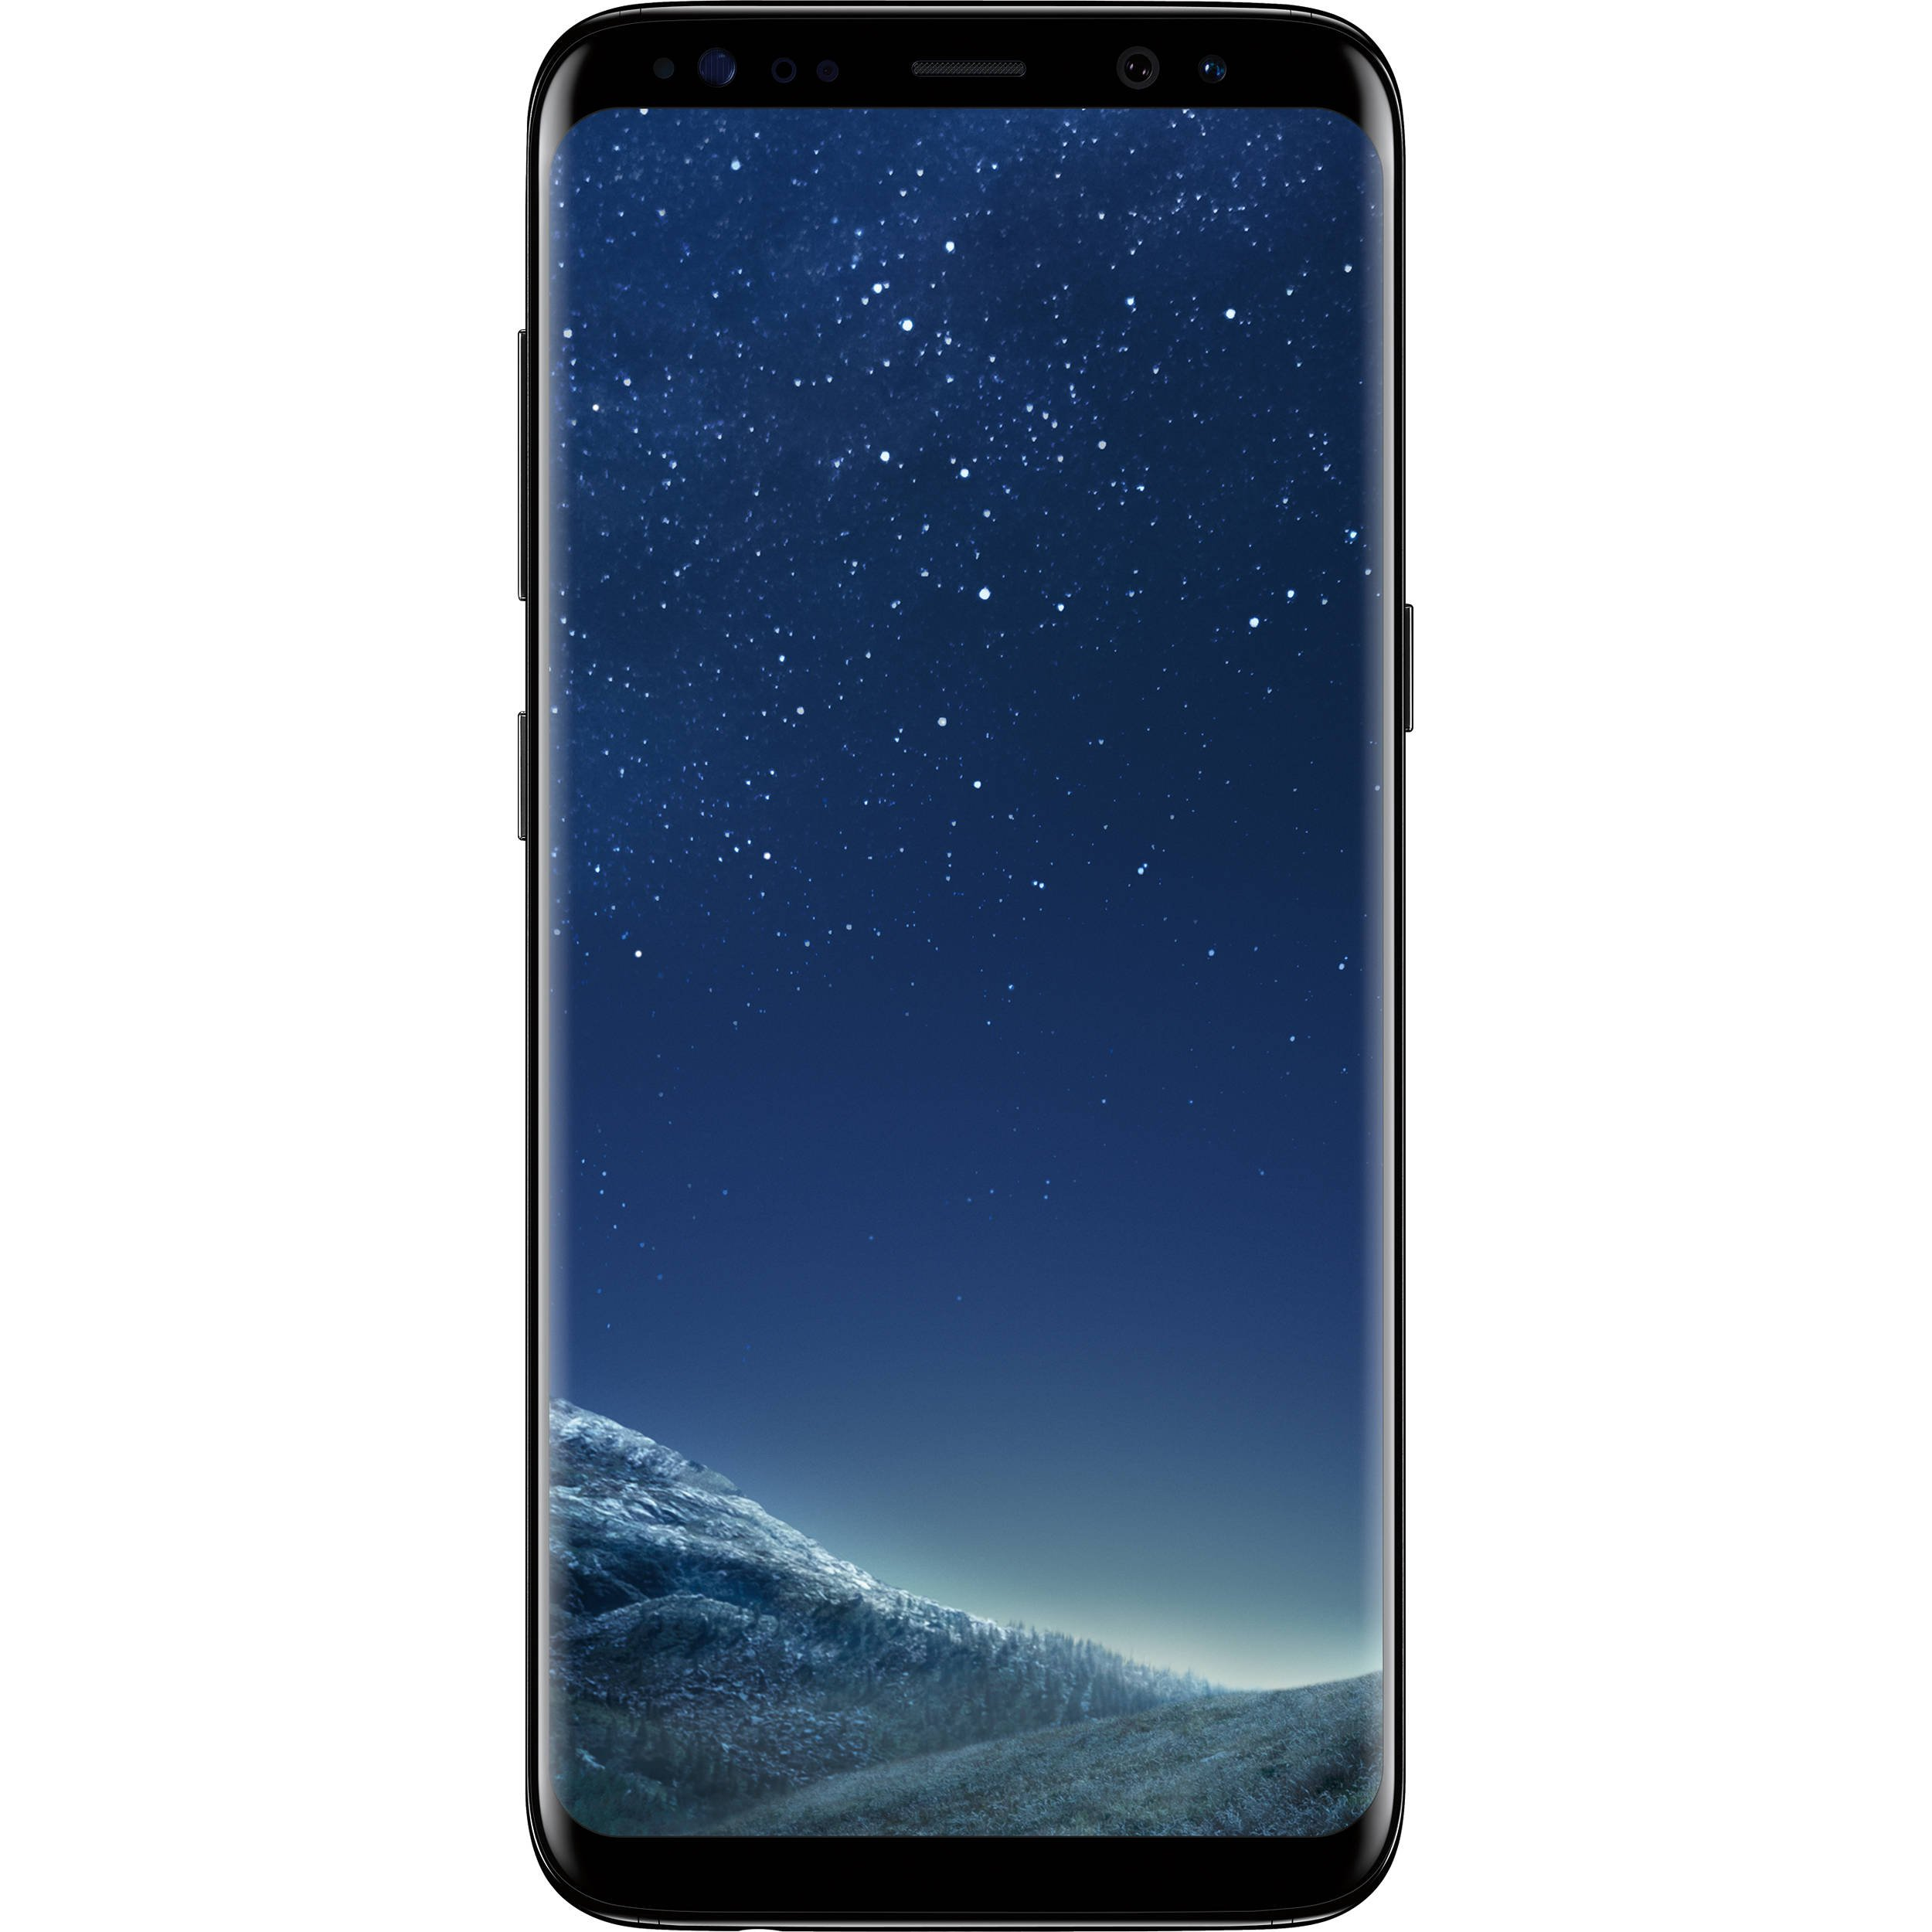 Samsung Galaxy S8 - Unlocked  - Midnight Black (Renewed) by Samsung